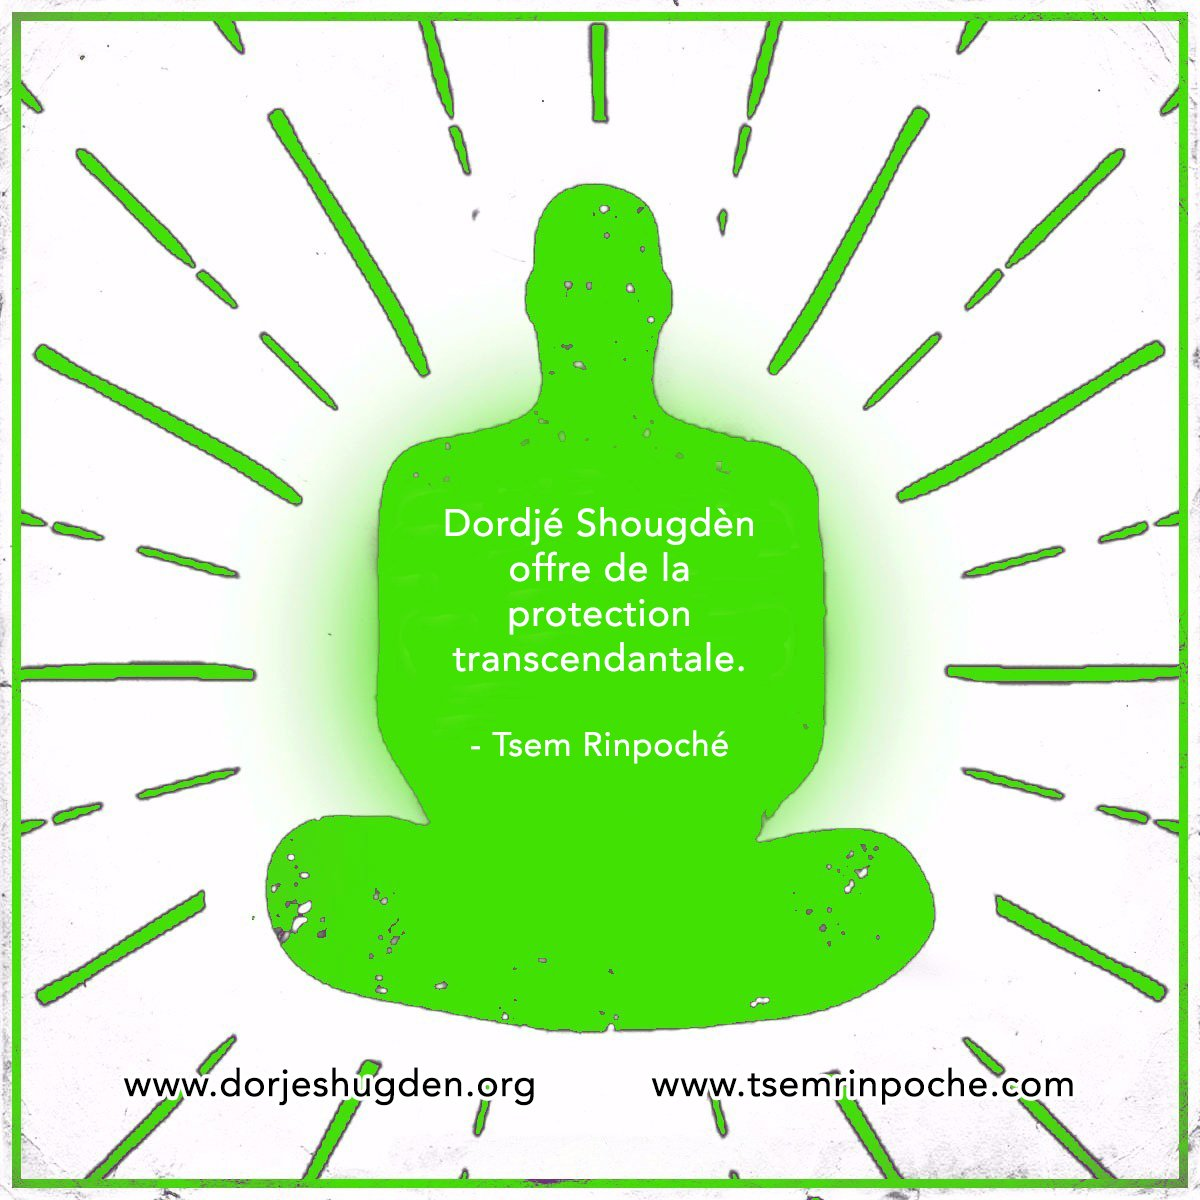 Les Grandes Vertus de Dordjé Shougdèn en Memes http://bit.ly/2NhWE8V  #TsemRinpoche #religion #ReligiousFreedom #Tibet #Tibetan #TibetCause #rangzen #DalaiLama #travel #book #India #China #Bangalore #French #France #Europe #PeaceAndLove #compassion #love #unity #unite #harmony